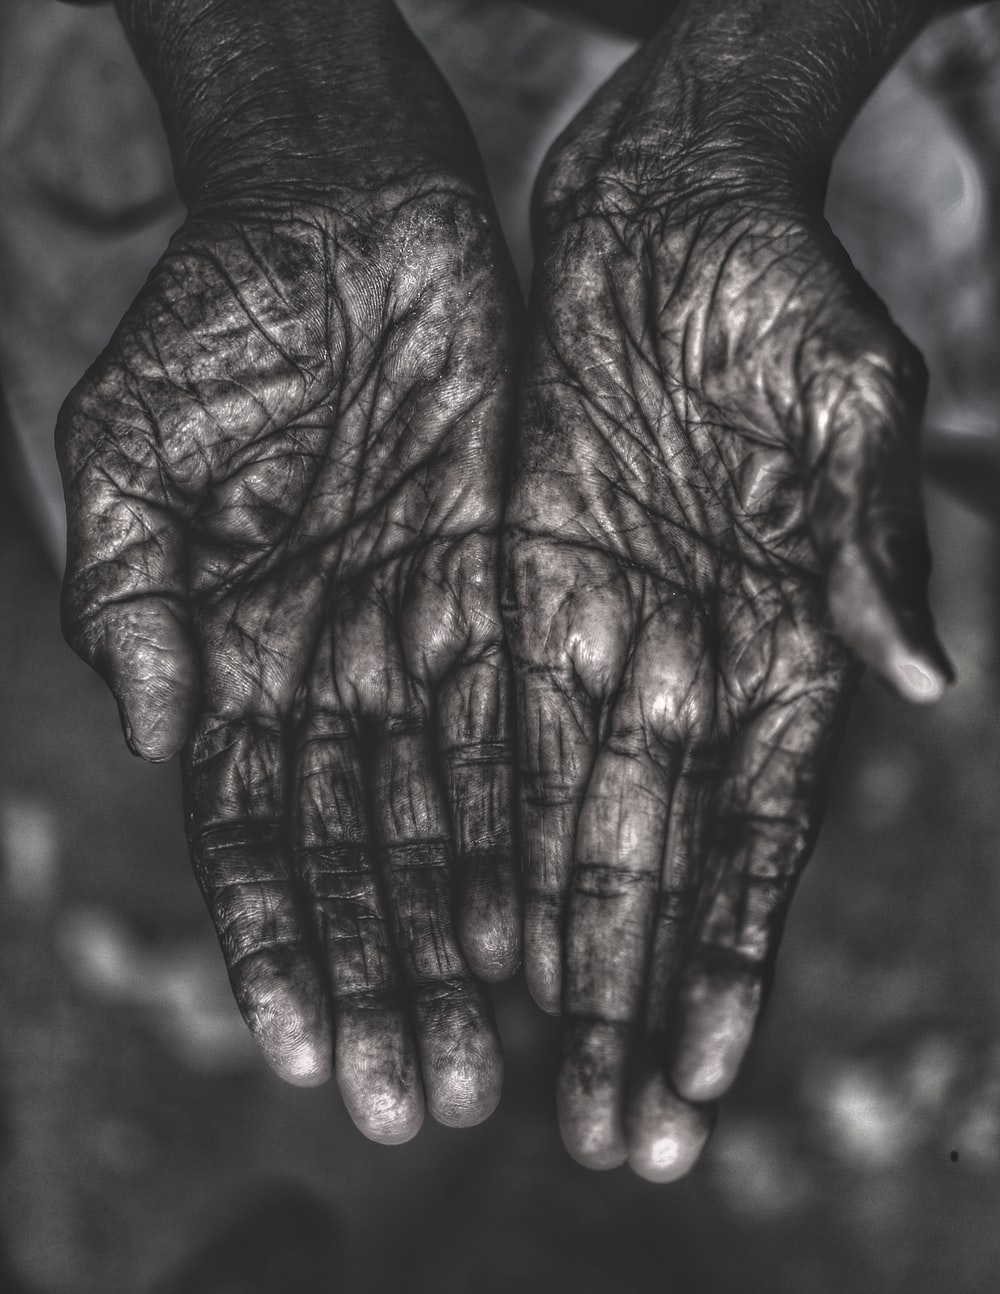 grayscale photo of human palms